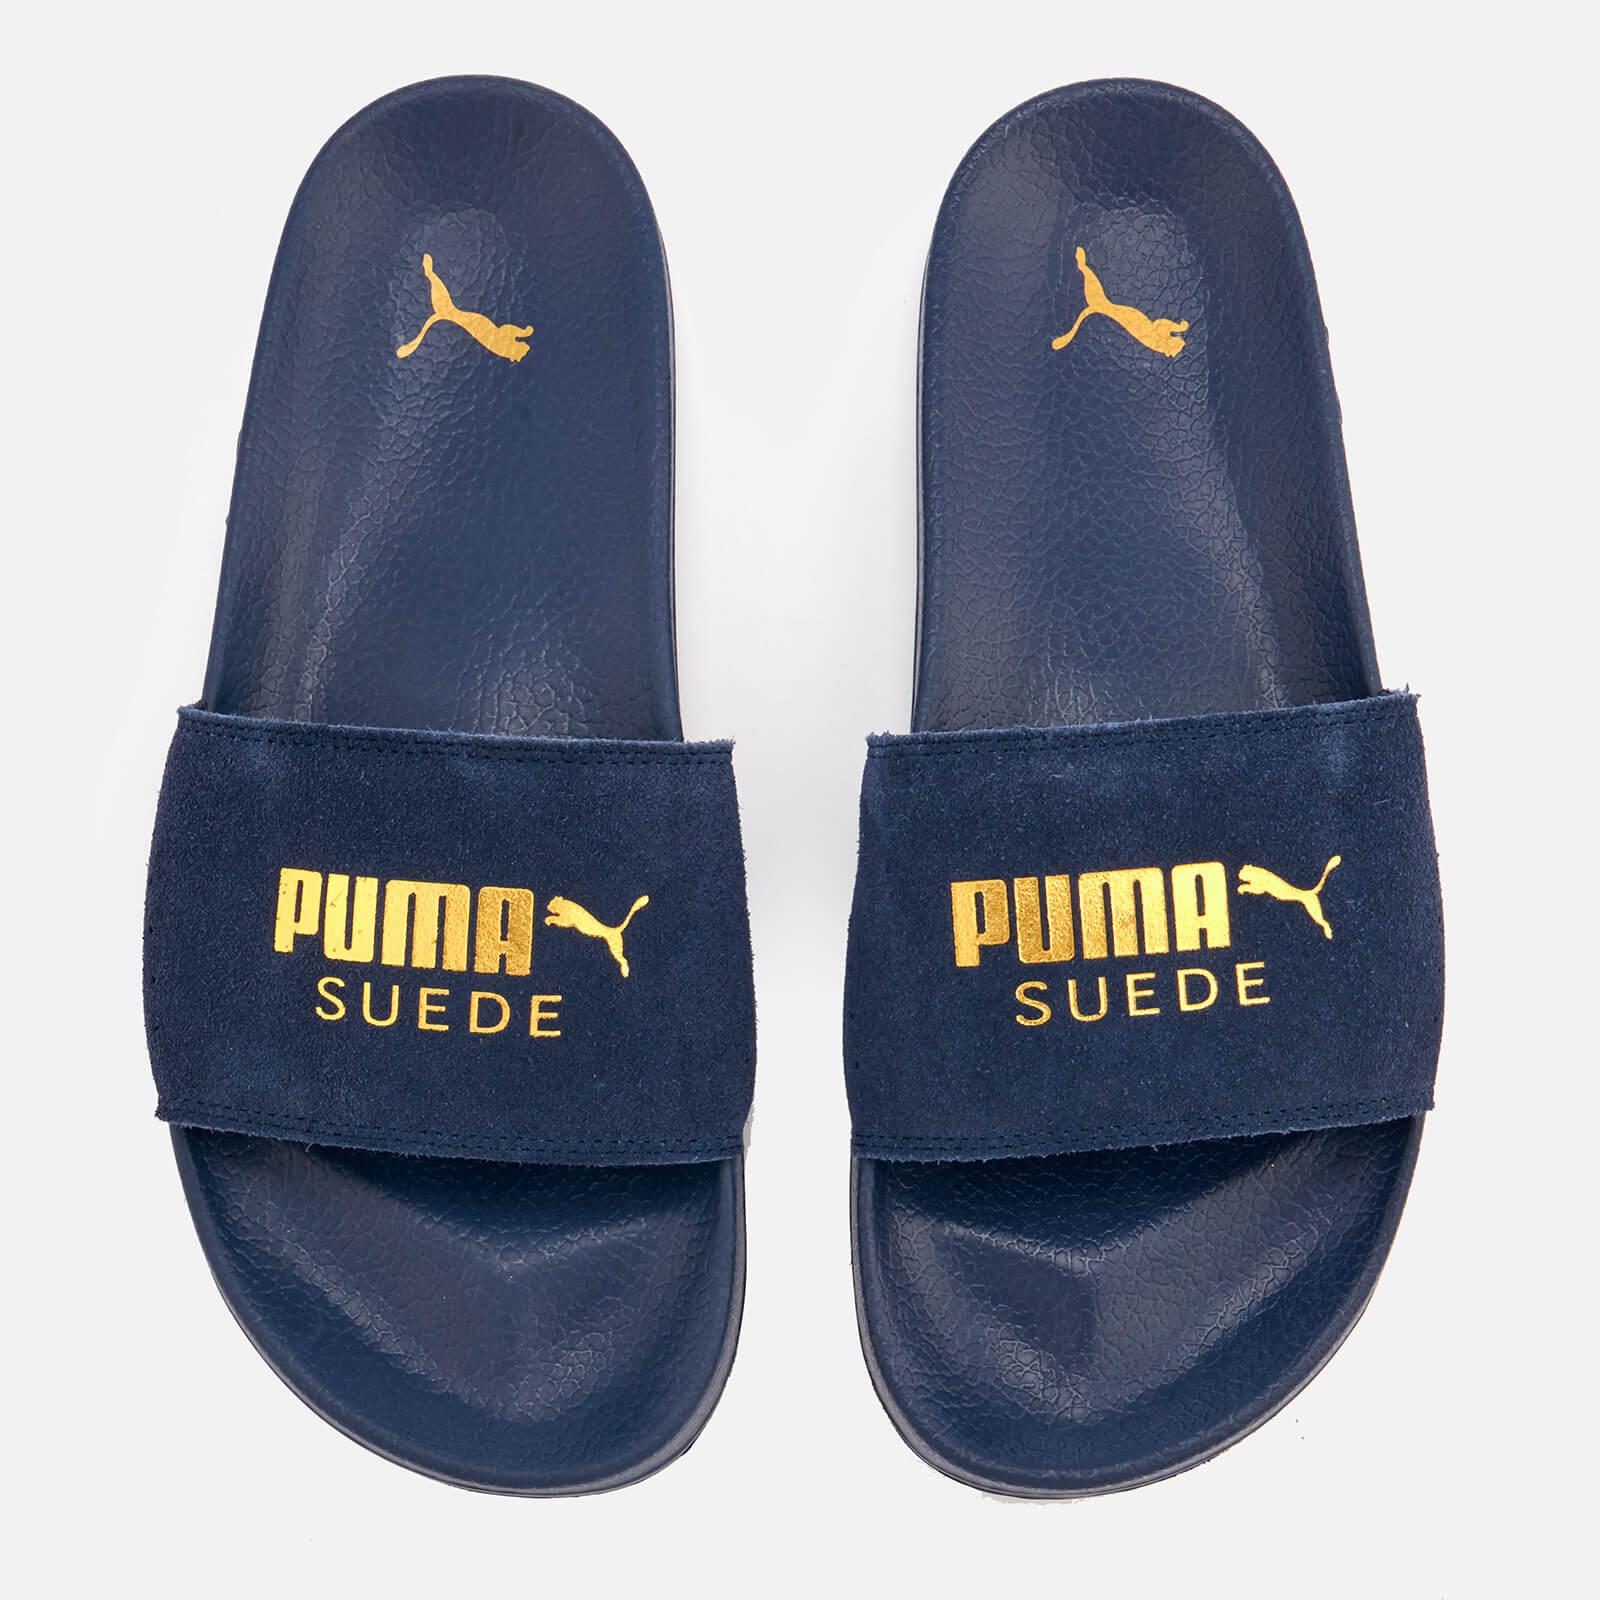 bb29e059b298 Puma Men s Leadcat Suede Slide Sandals - Peacoat Puma Team Gold - Free UK  Delivery over £50